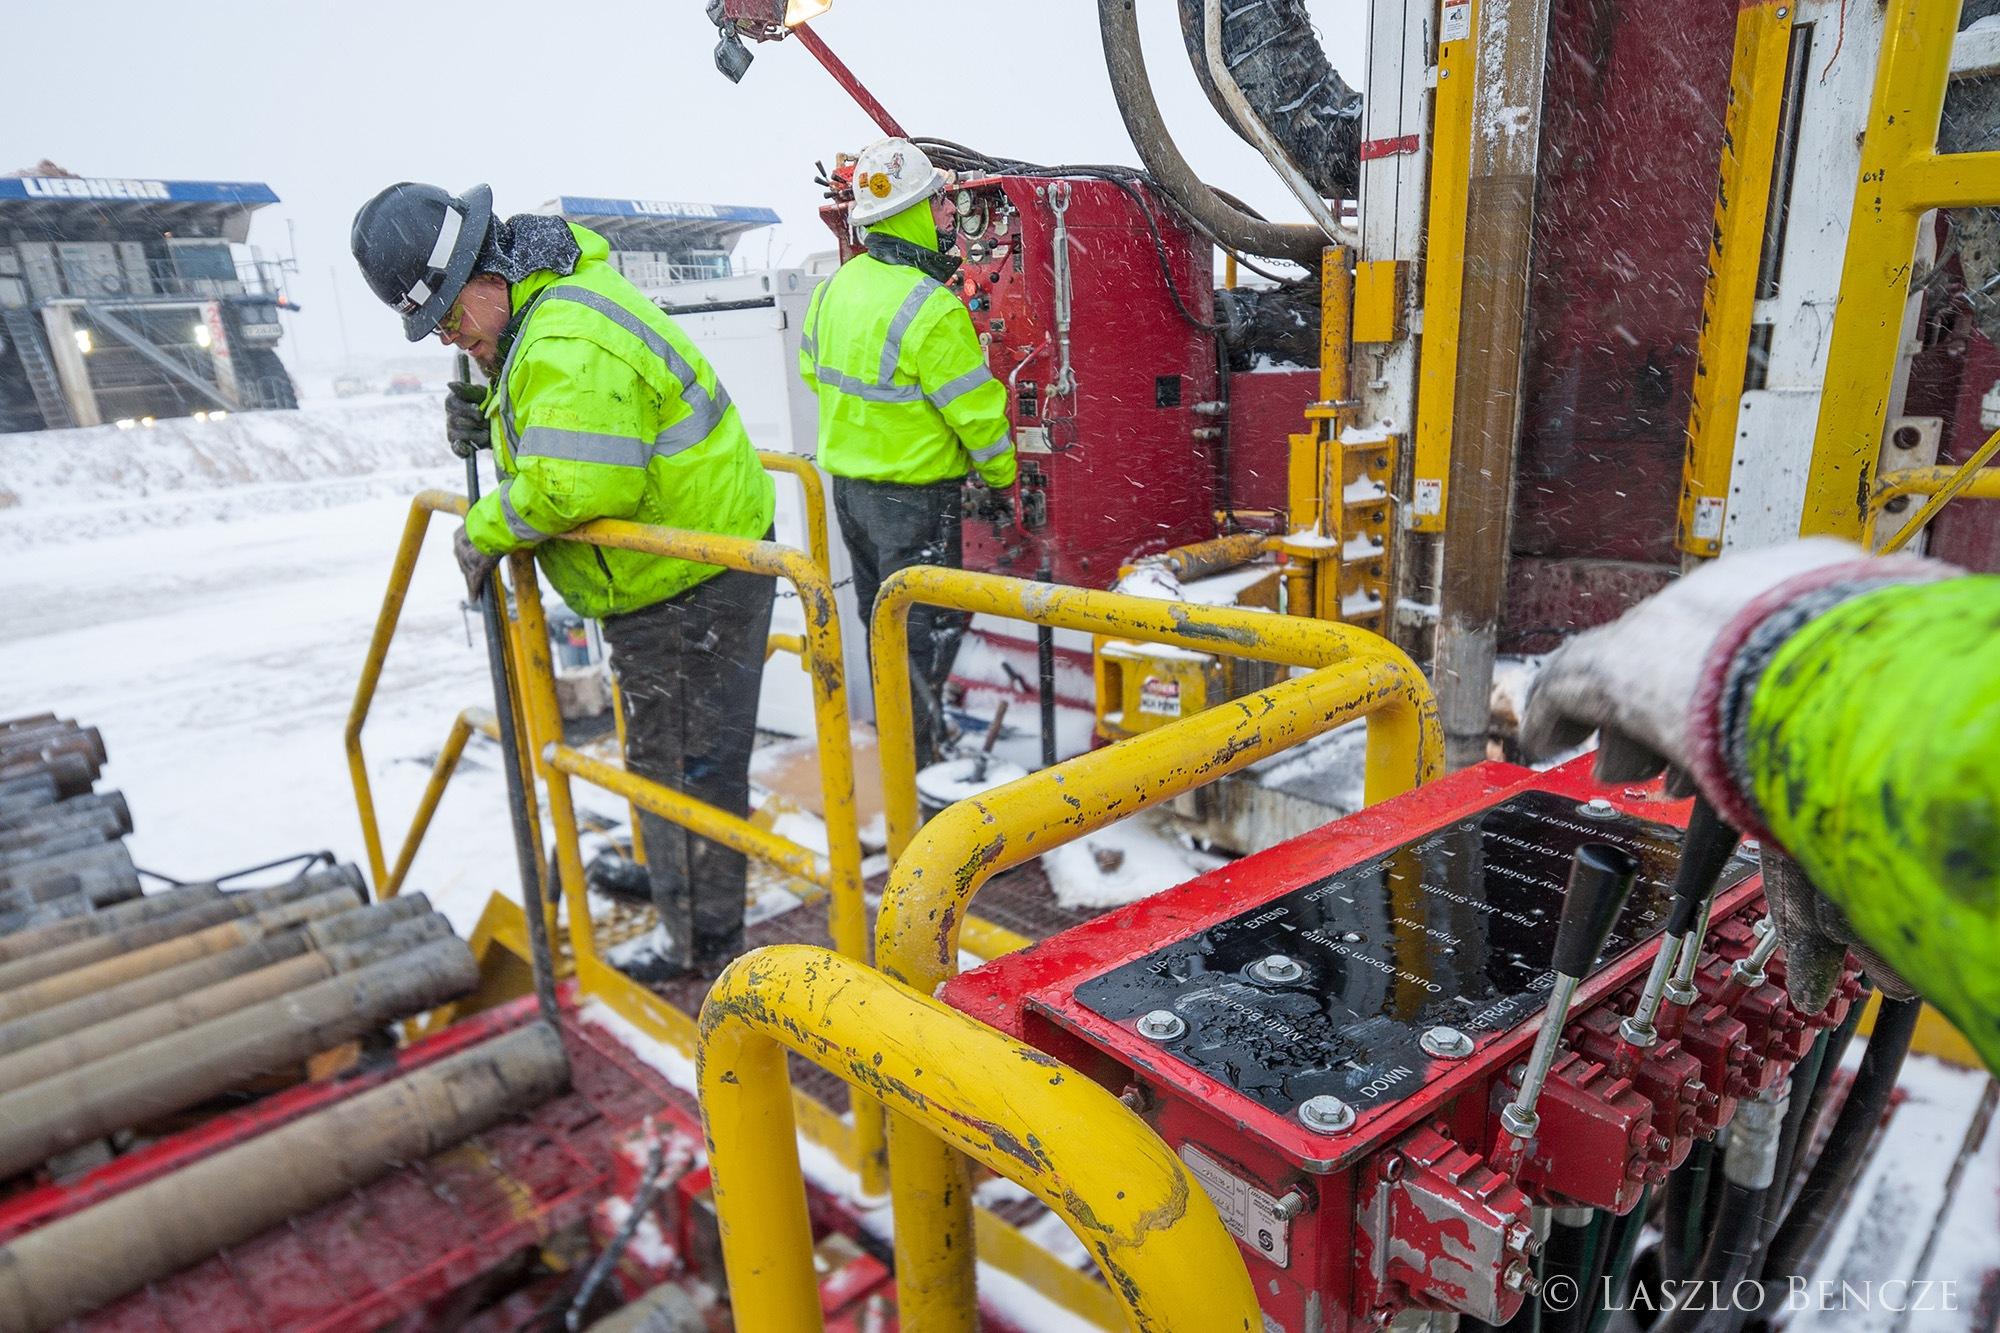 Winter Drilling by Laszlo Bencze